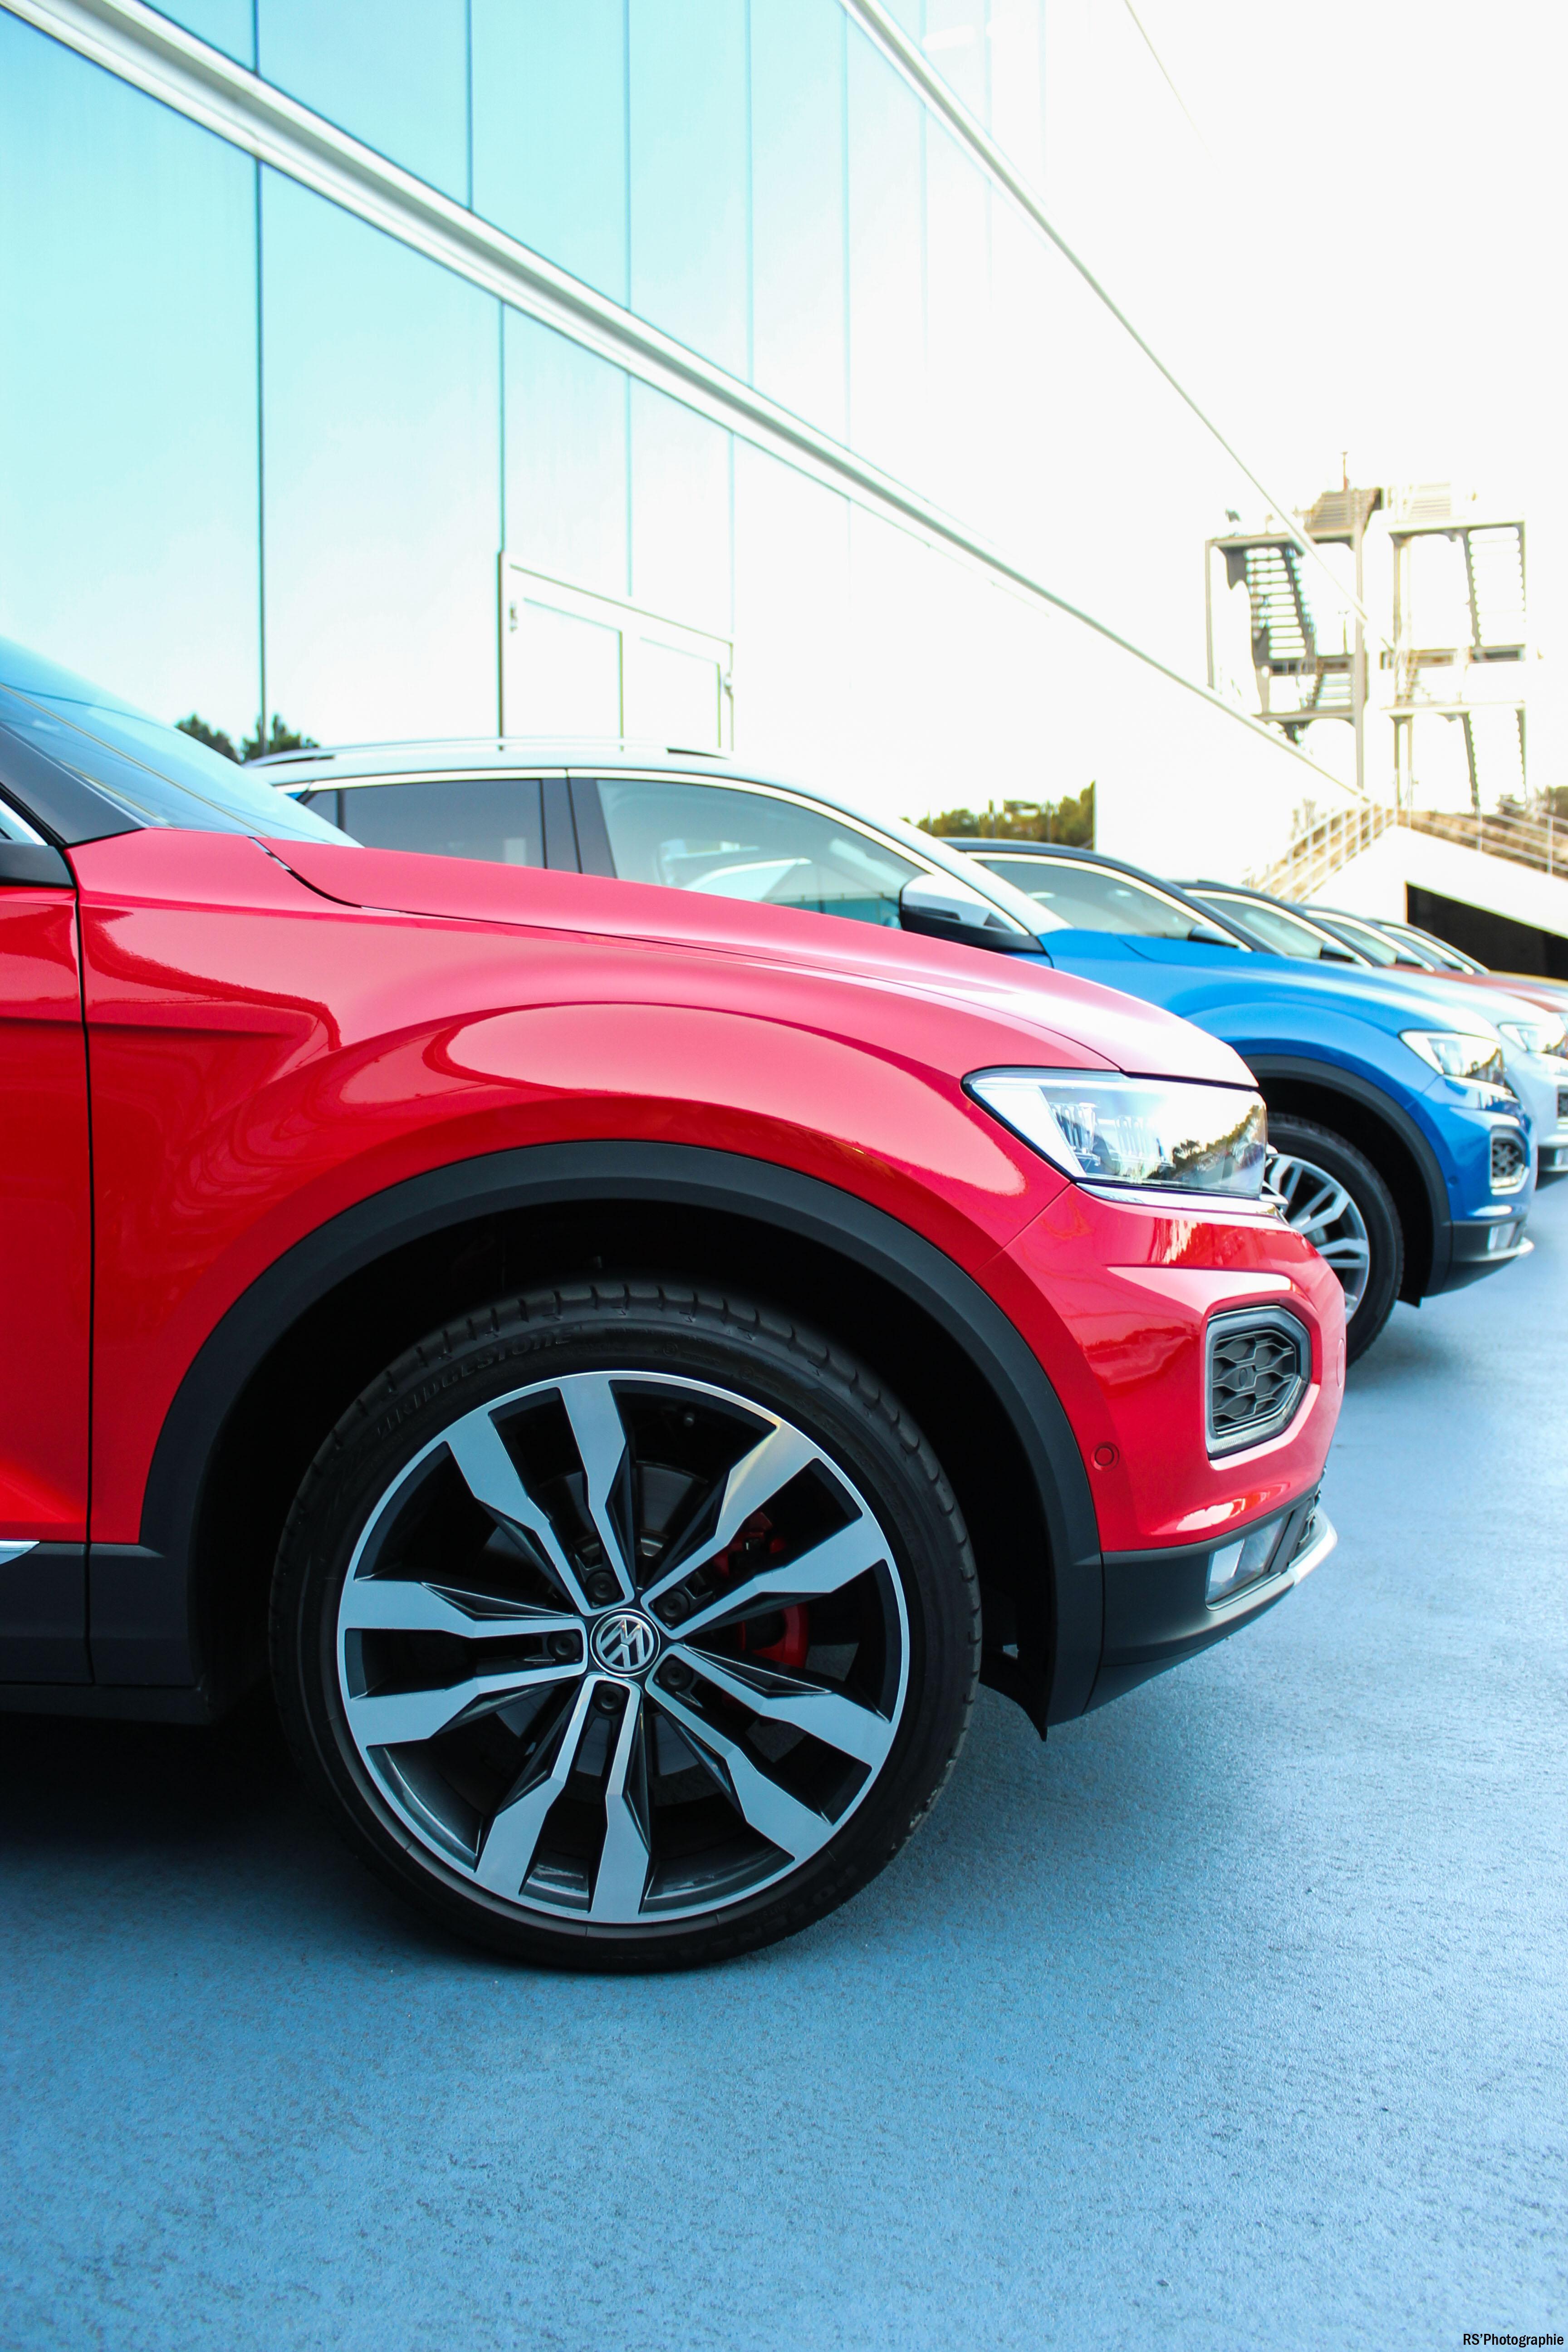 Volkswagentroc58-vw-t-roc-avant-front-Arnaud Demasier-RSPhotographie